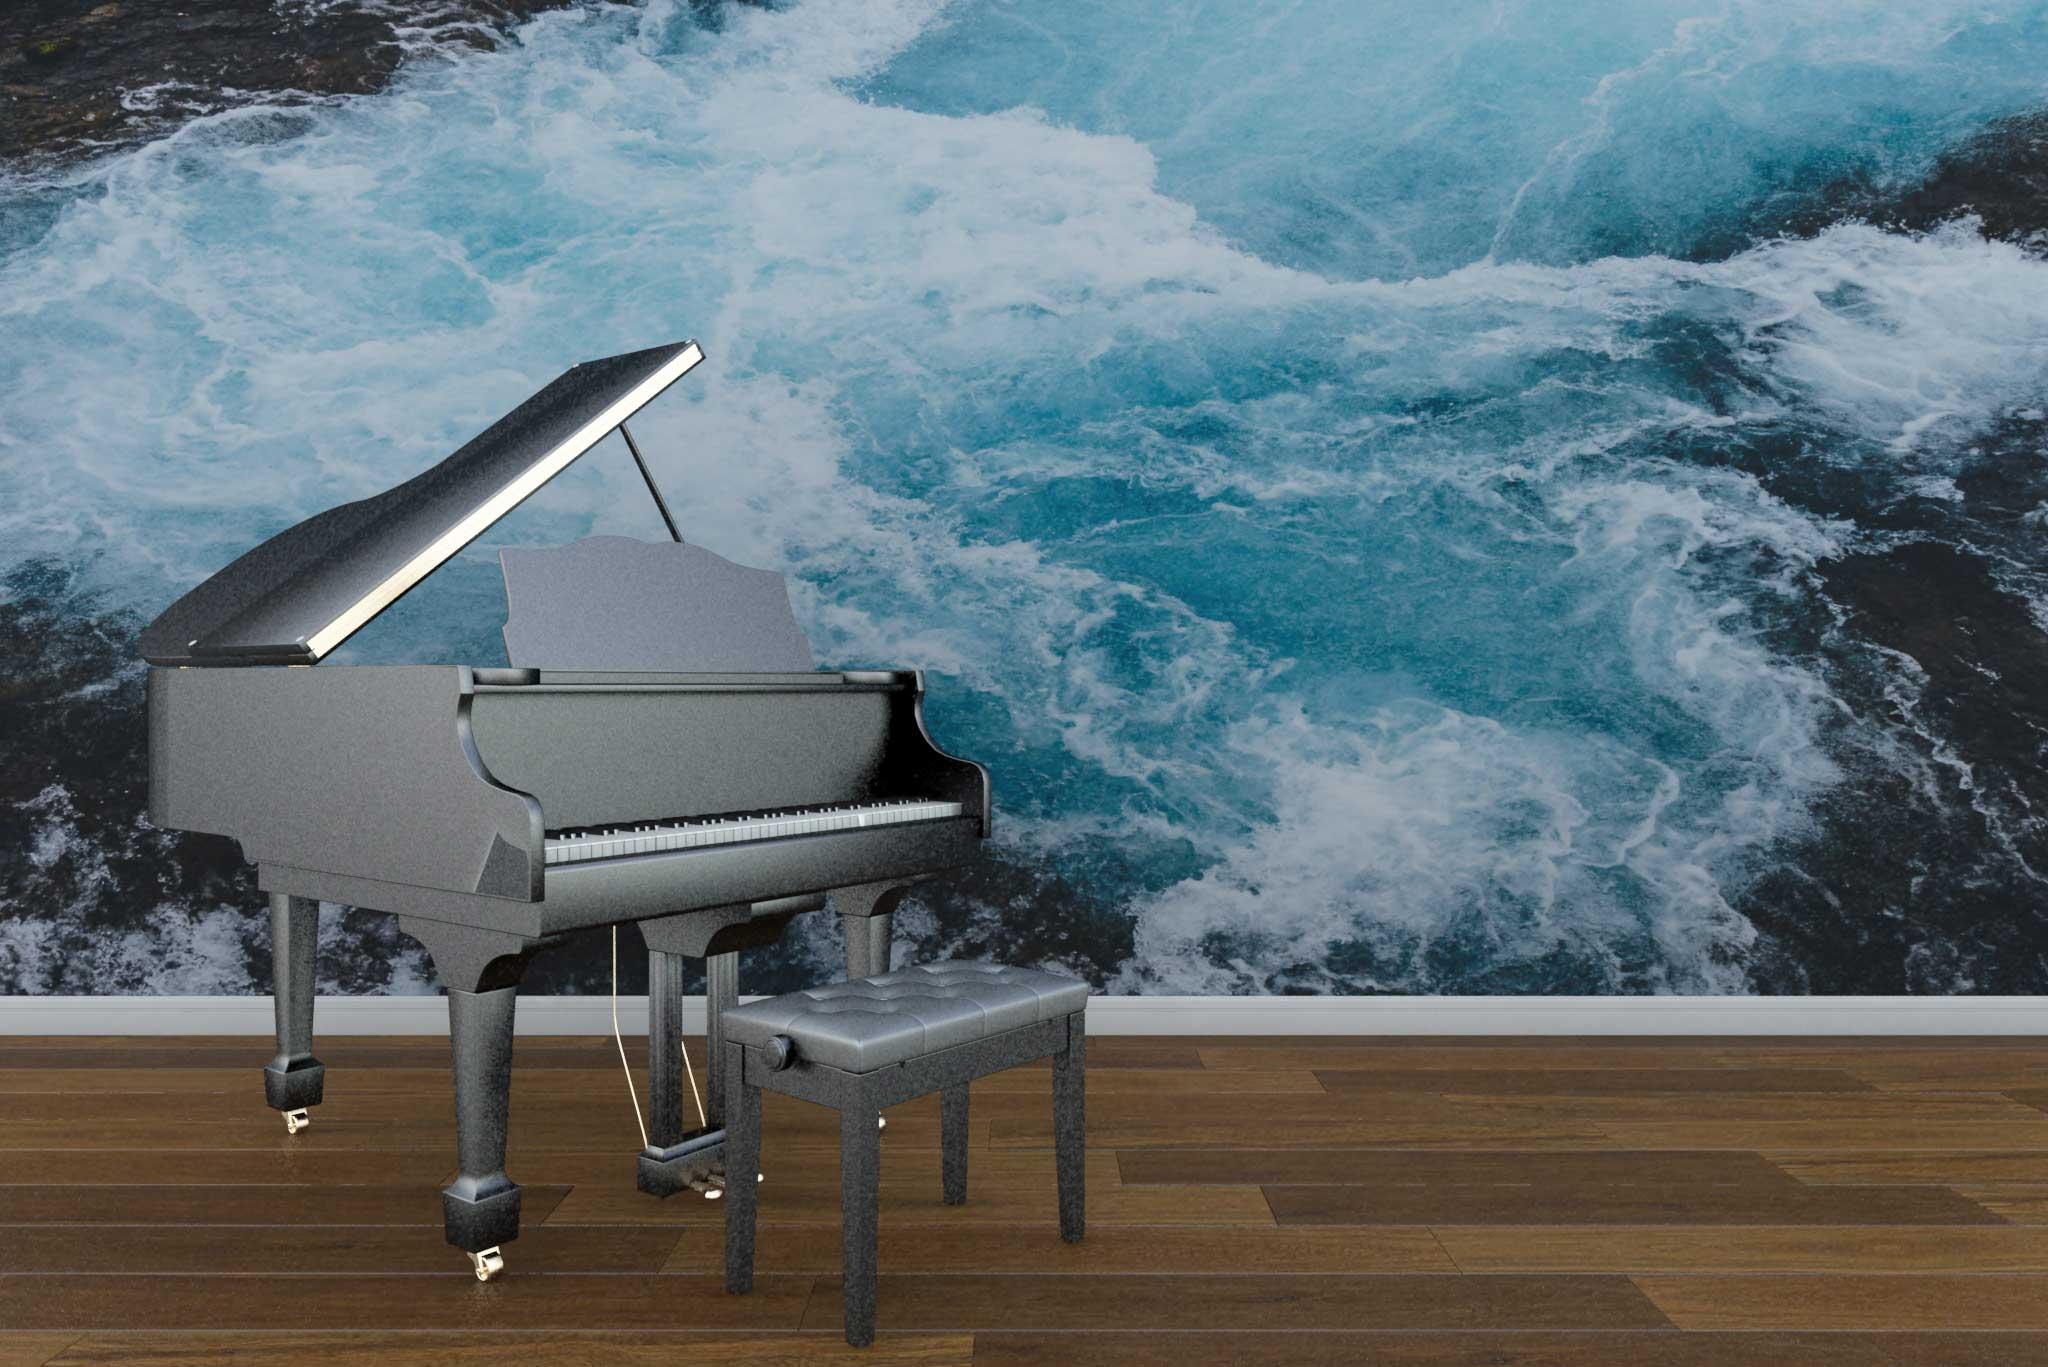 tapet-fototapet-comanda-personalizat-bucuresti-model-fotografie-mare-ocean-valuri